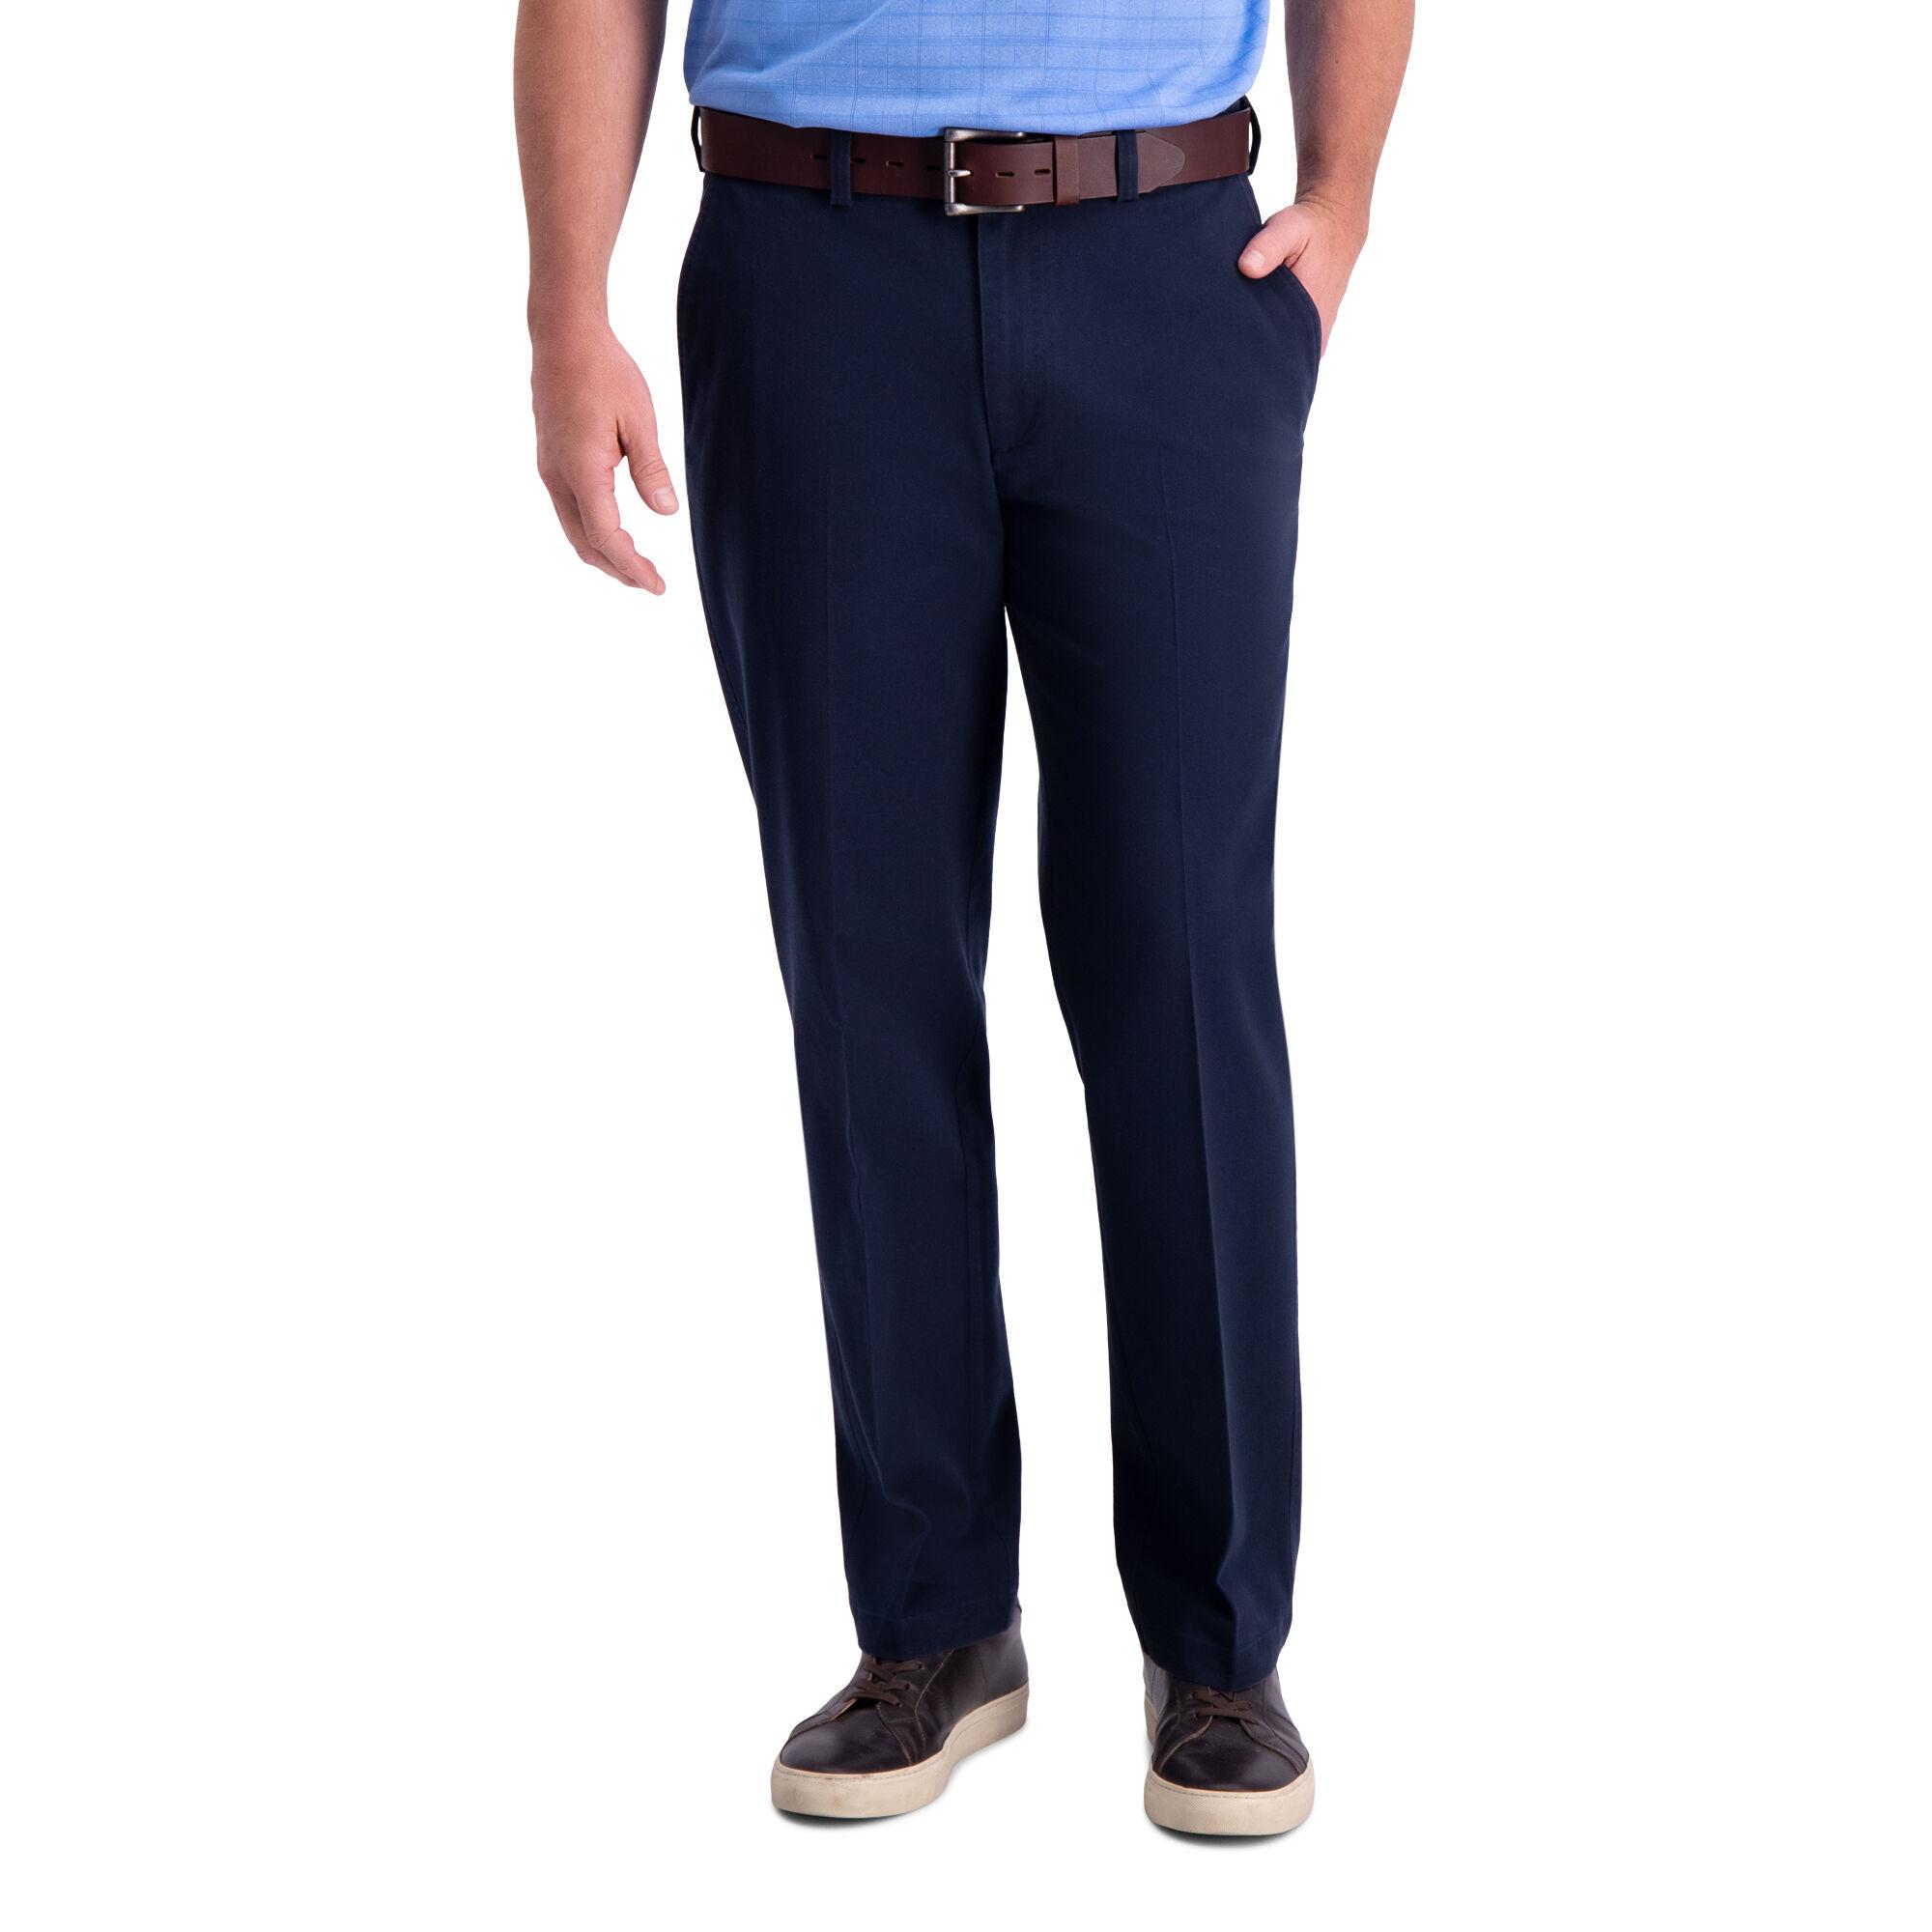 Premium Comfort Khaki Pant